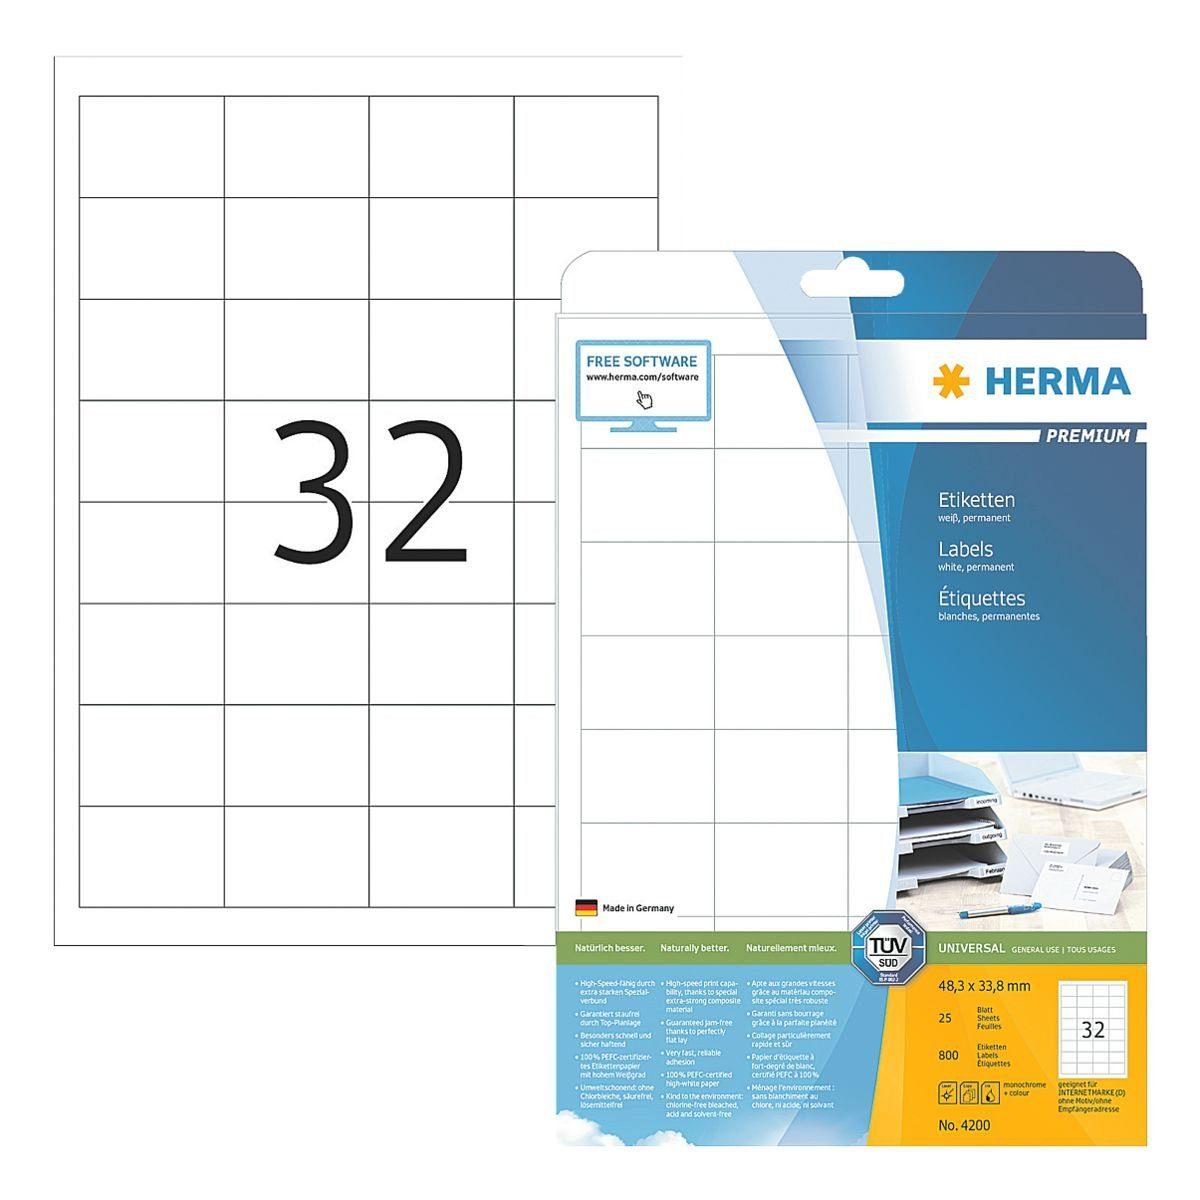 HERMA 800er-Pack Universal-Klebeetiketten »4200«